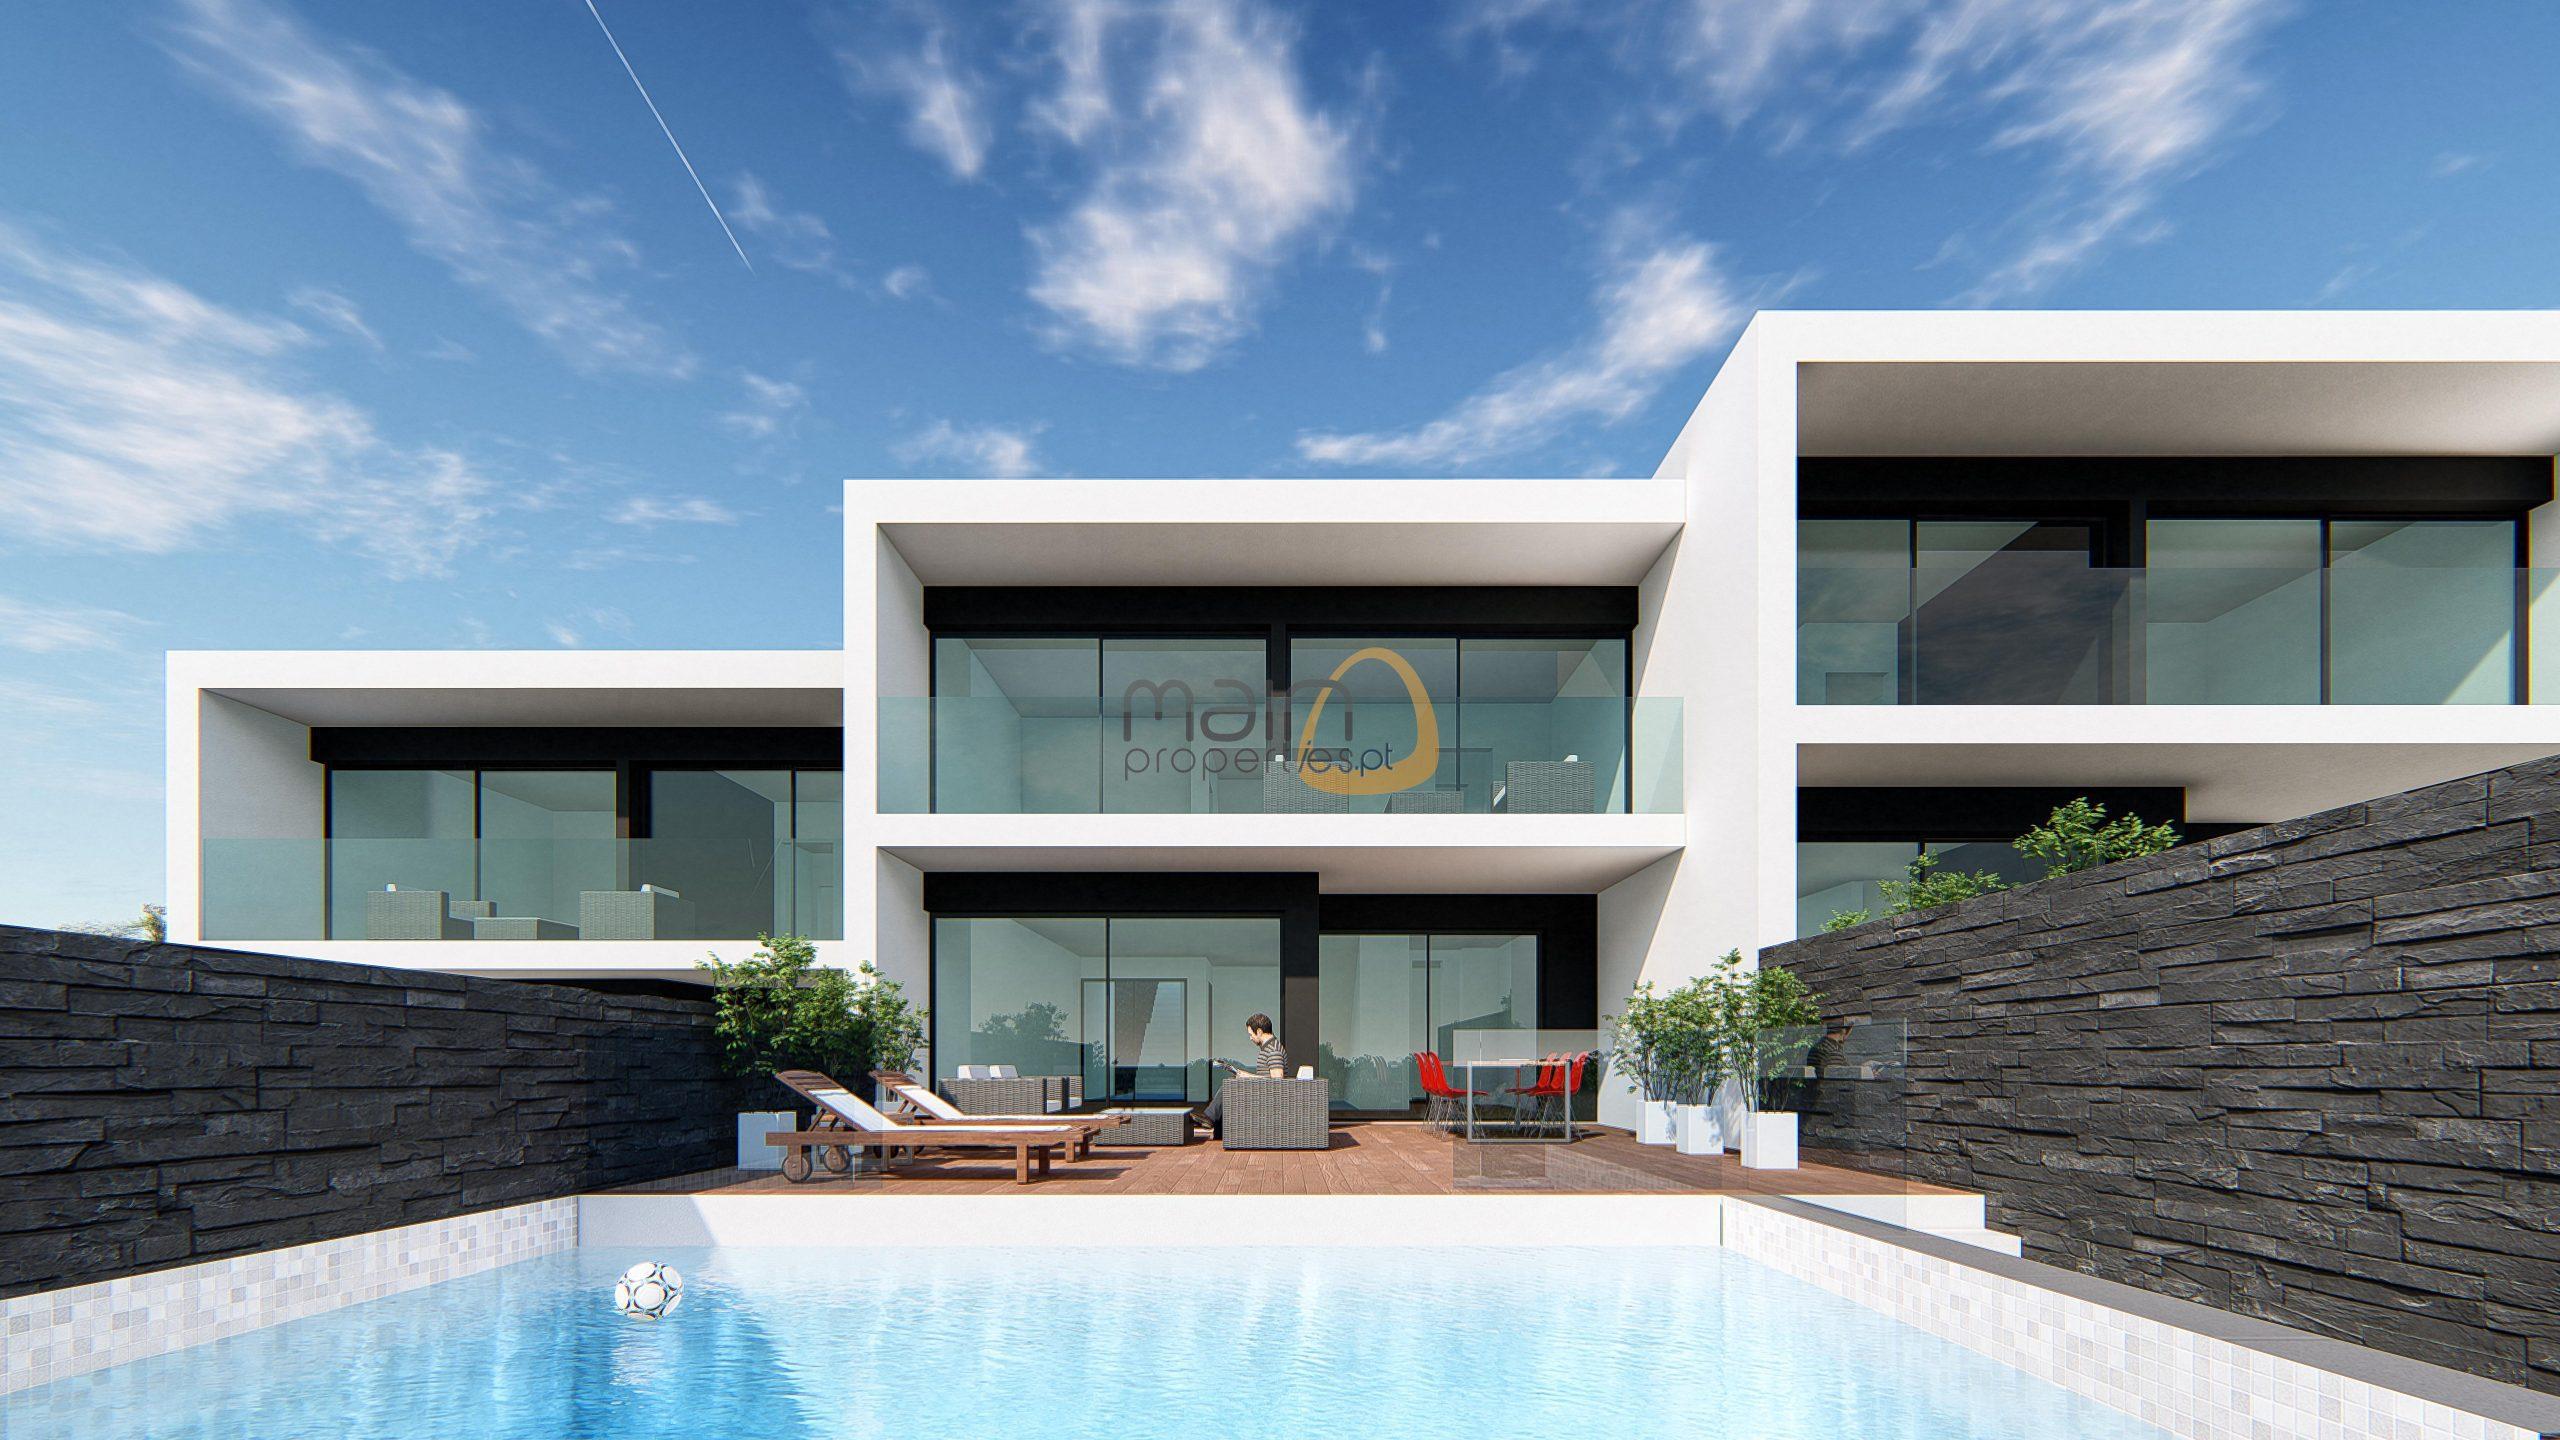 land-for-development-of-eleven-villas-with-sea-views-in-almancil-algarve-portugal-property-real-estate-09